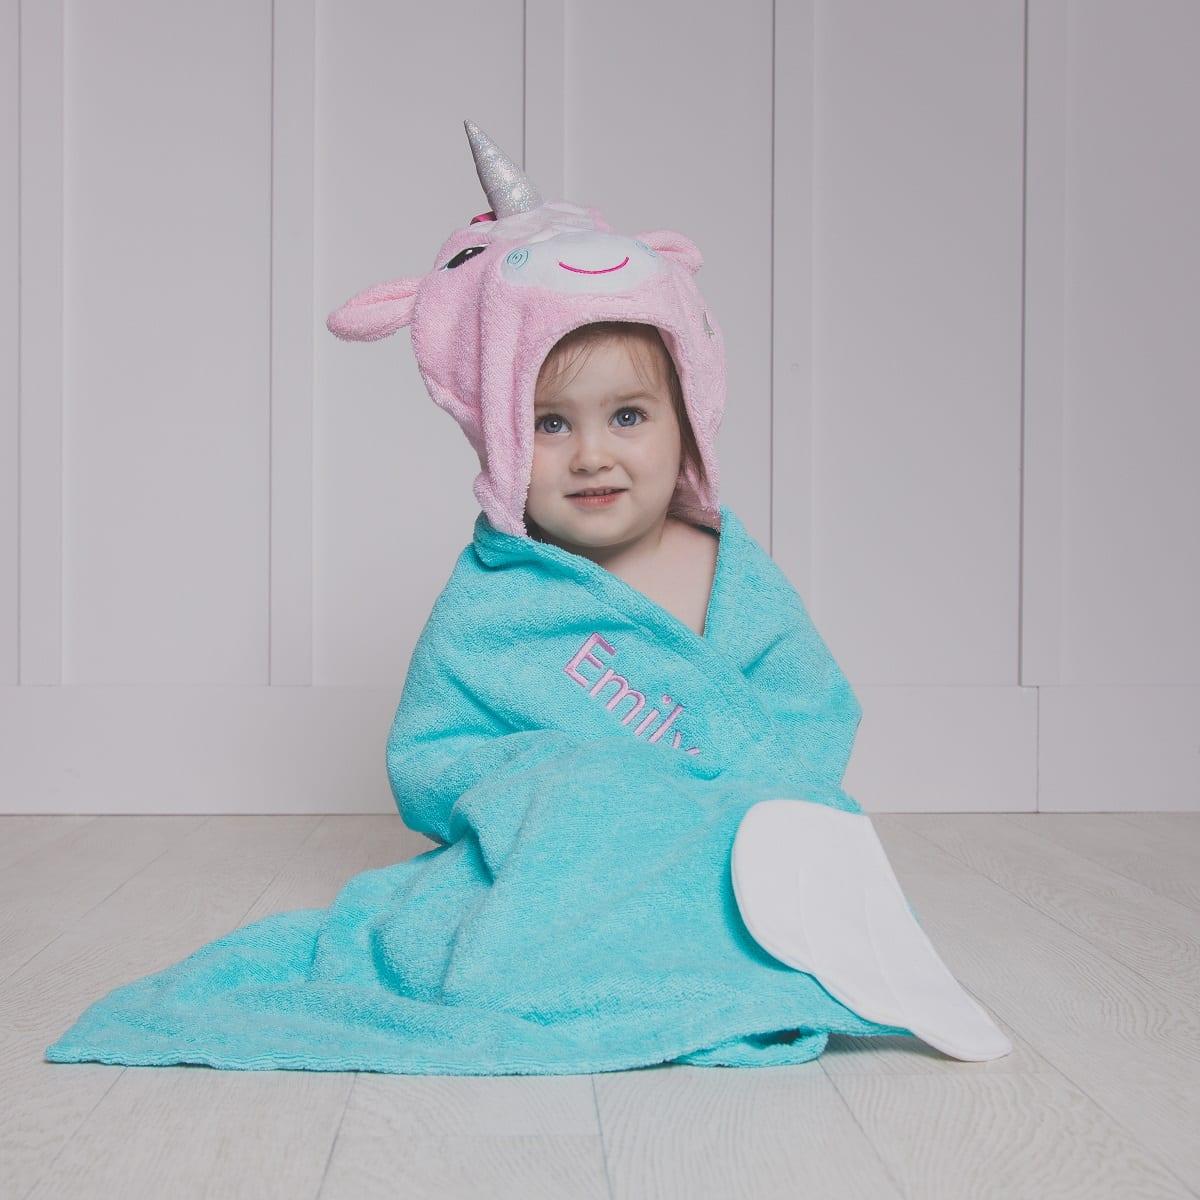 Personalised Zoocchini Aqua Allie the Unicorn Toddler Hooded Towel